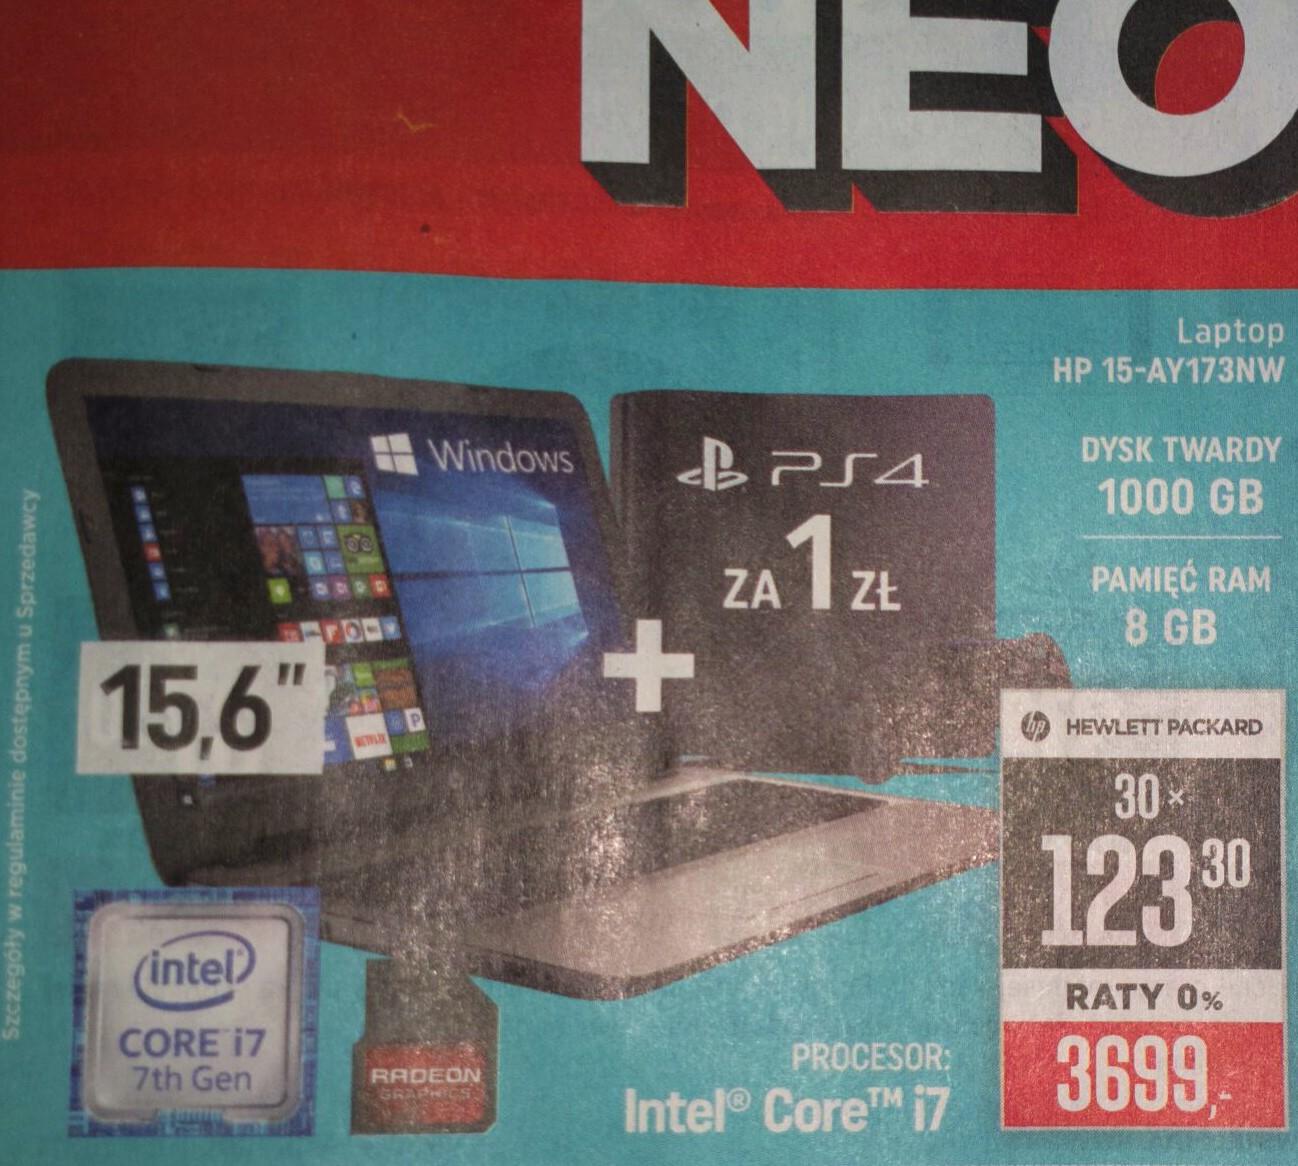 Neonet. Laptop hp 15-ay173nw + ps4 za 1zl 04.05-10.05.2017